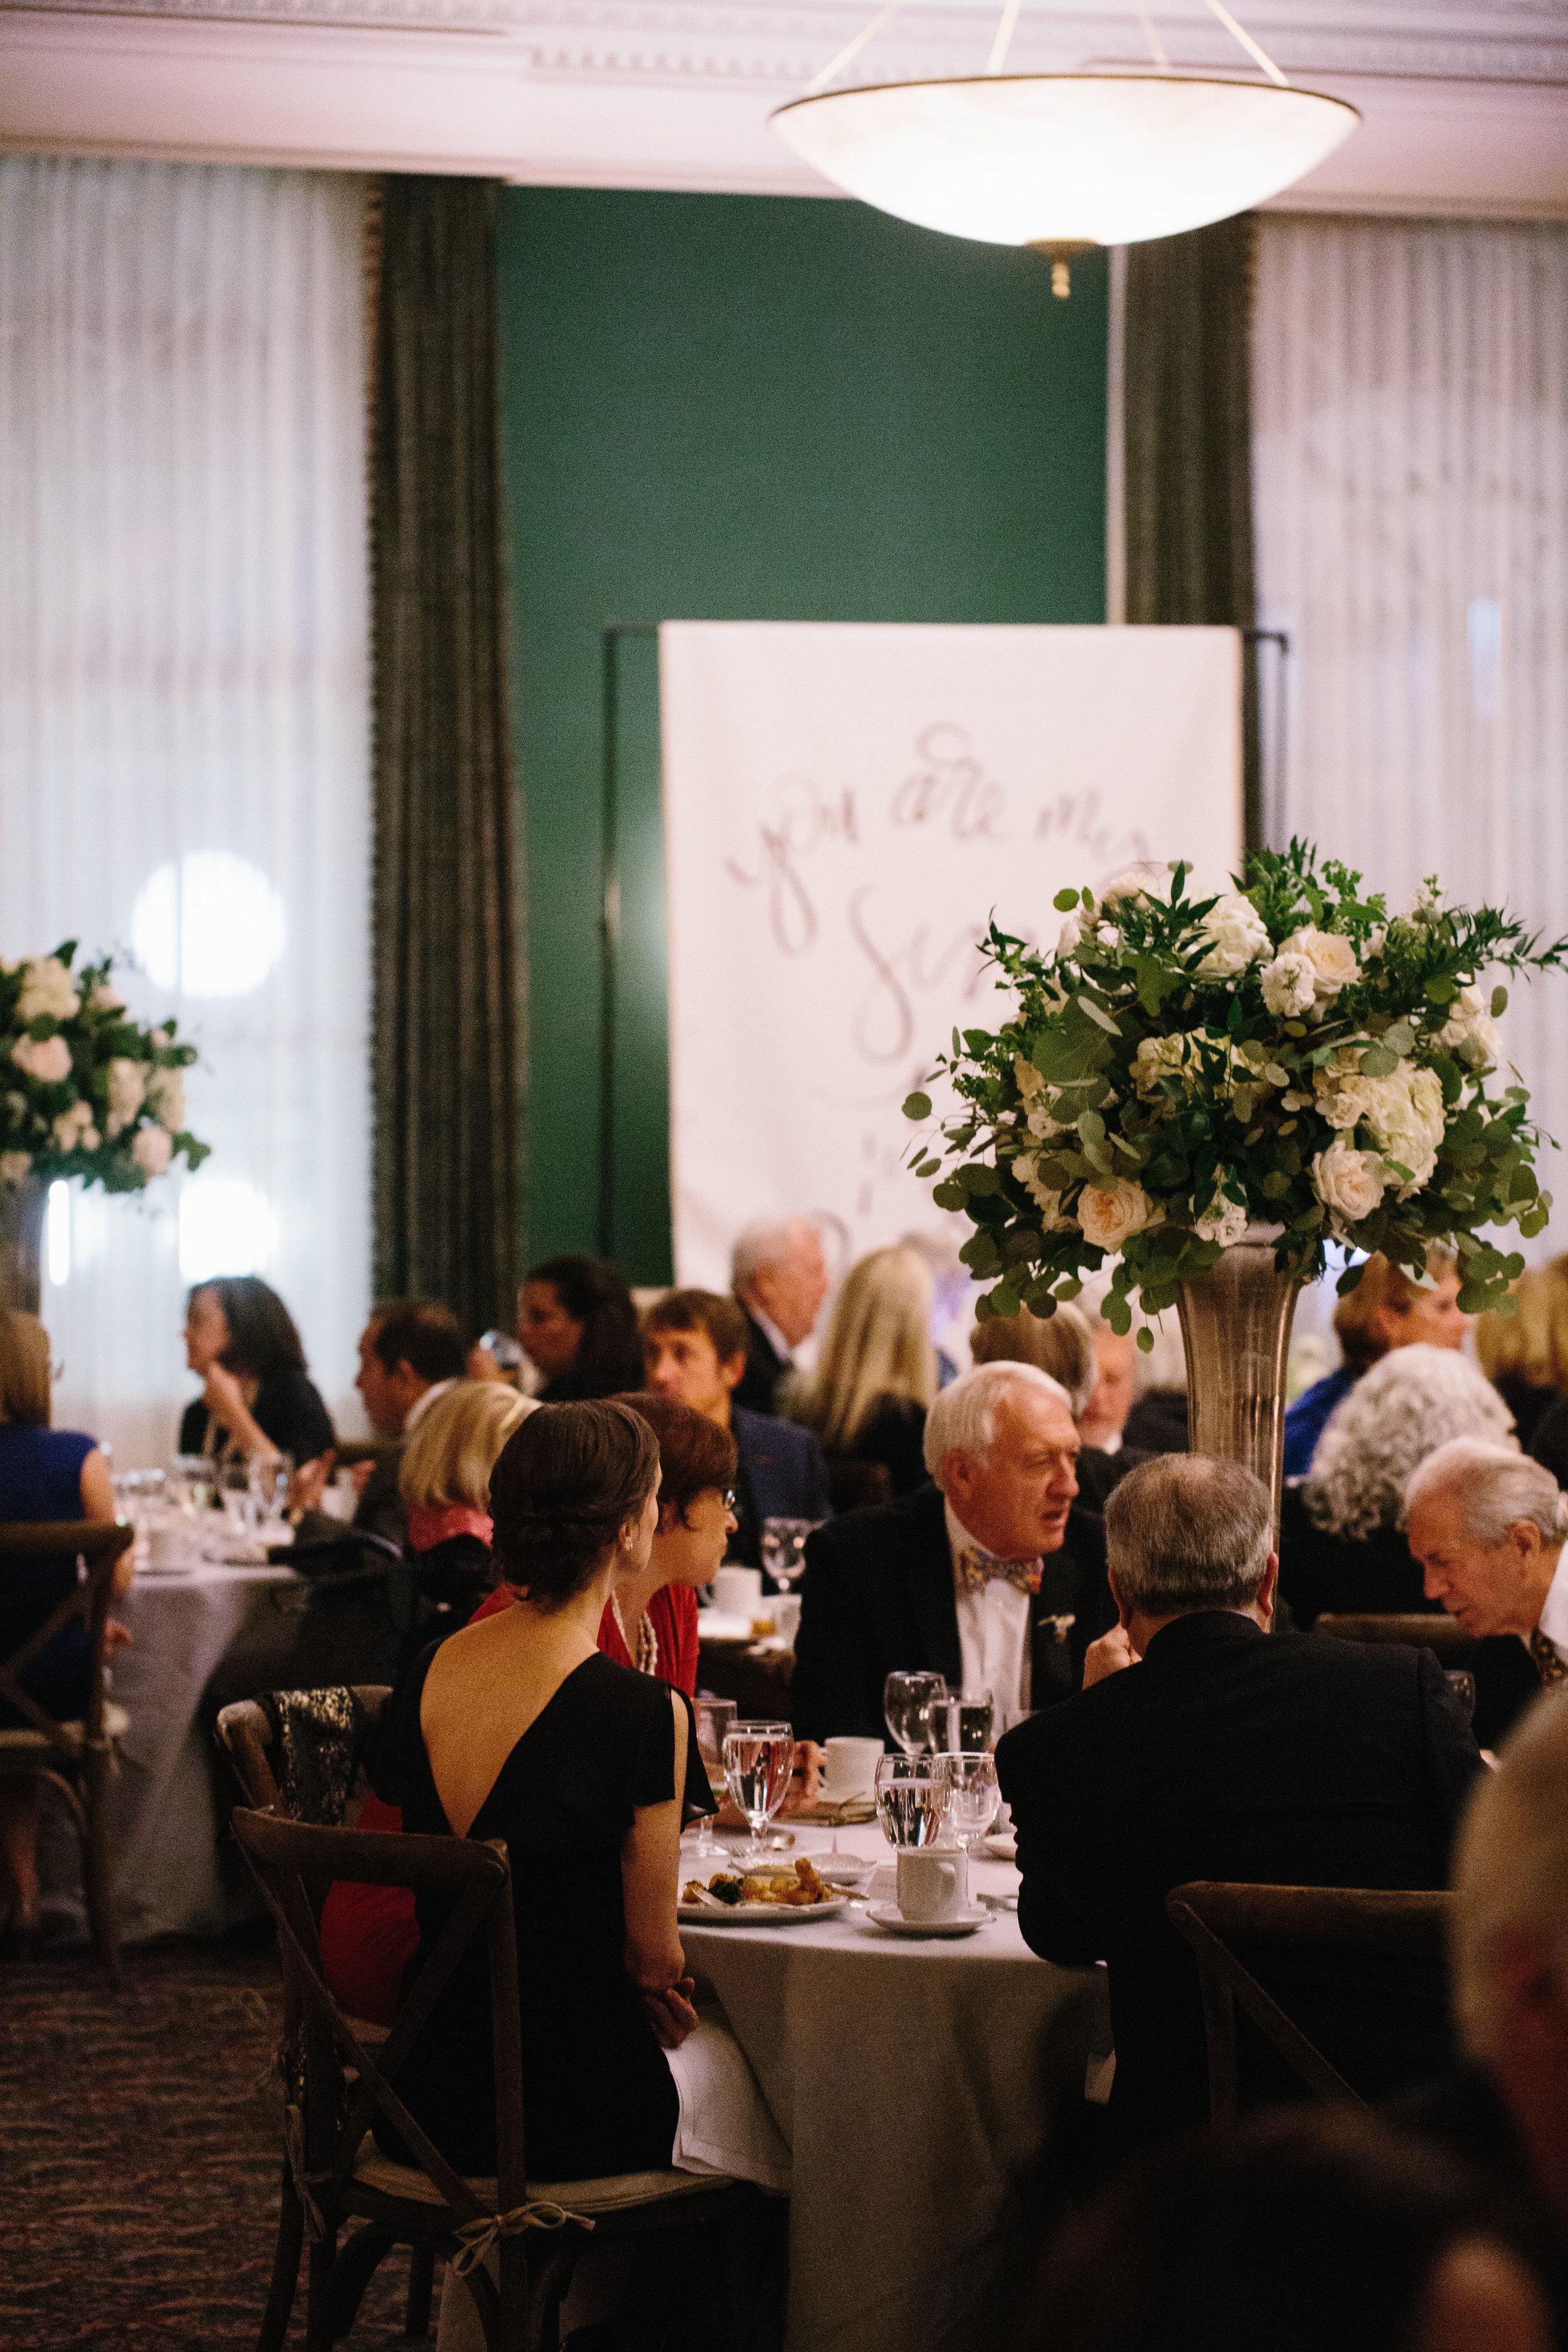 Anthony-and-Stork-Weddings-153.jpg